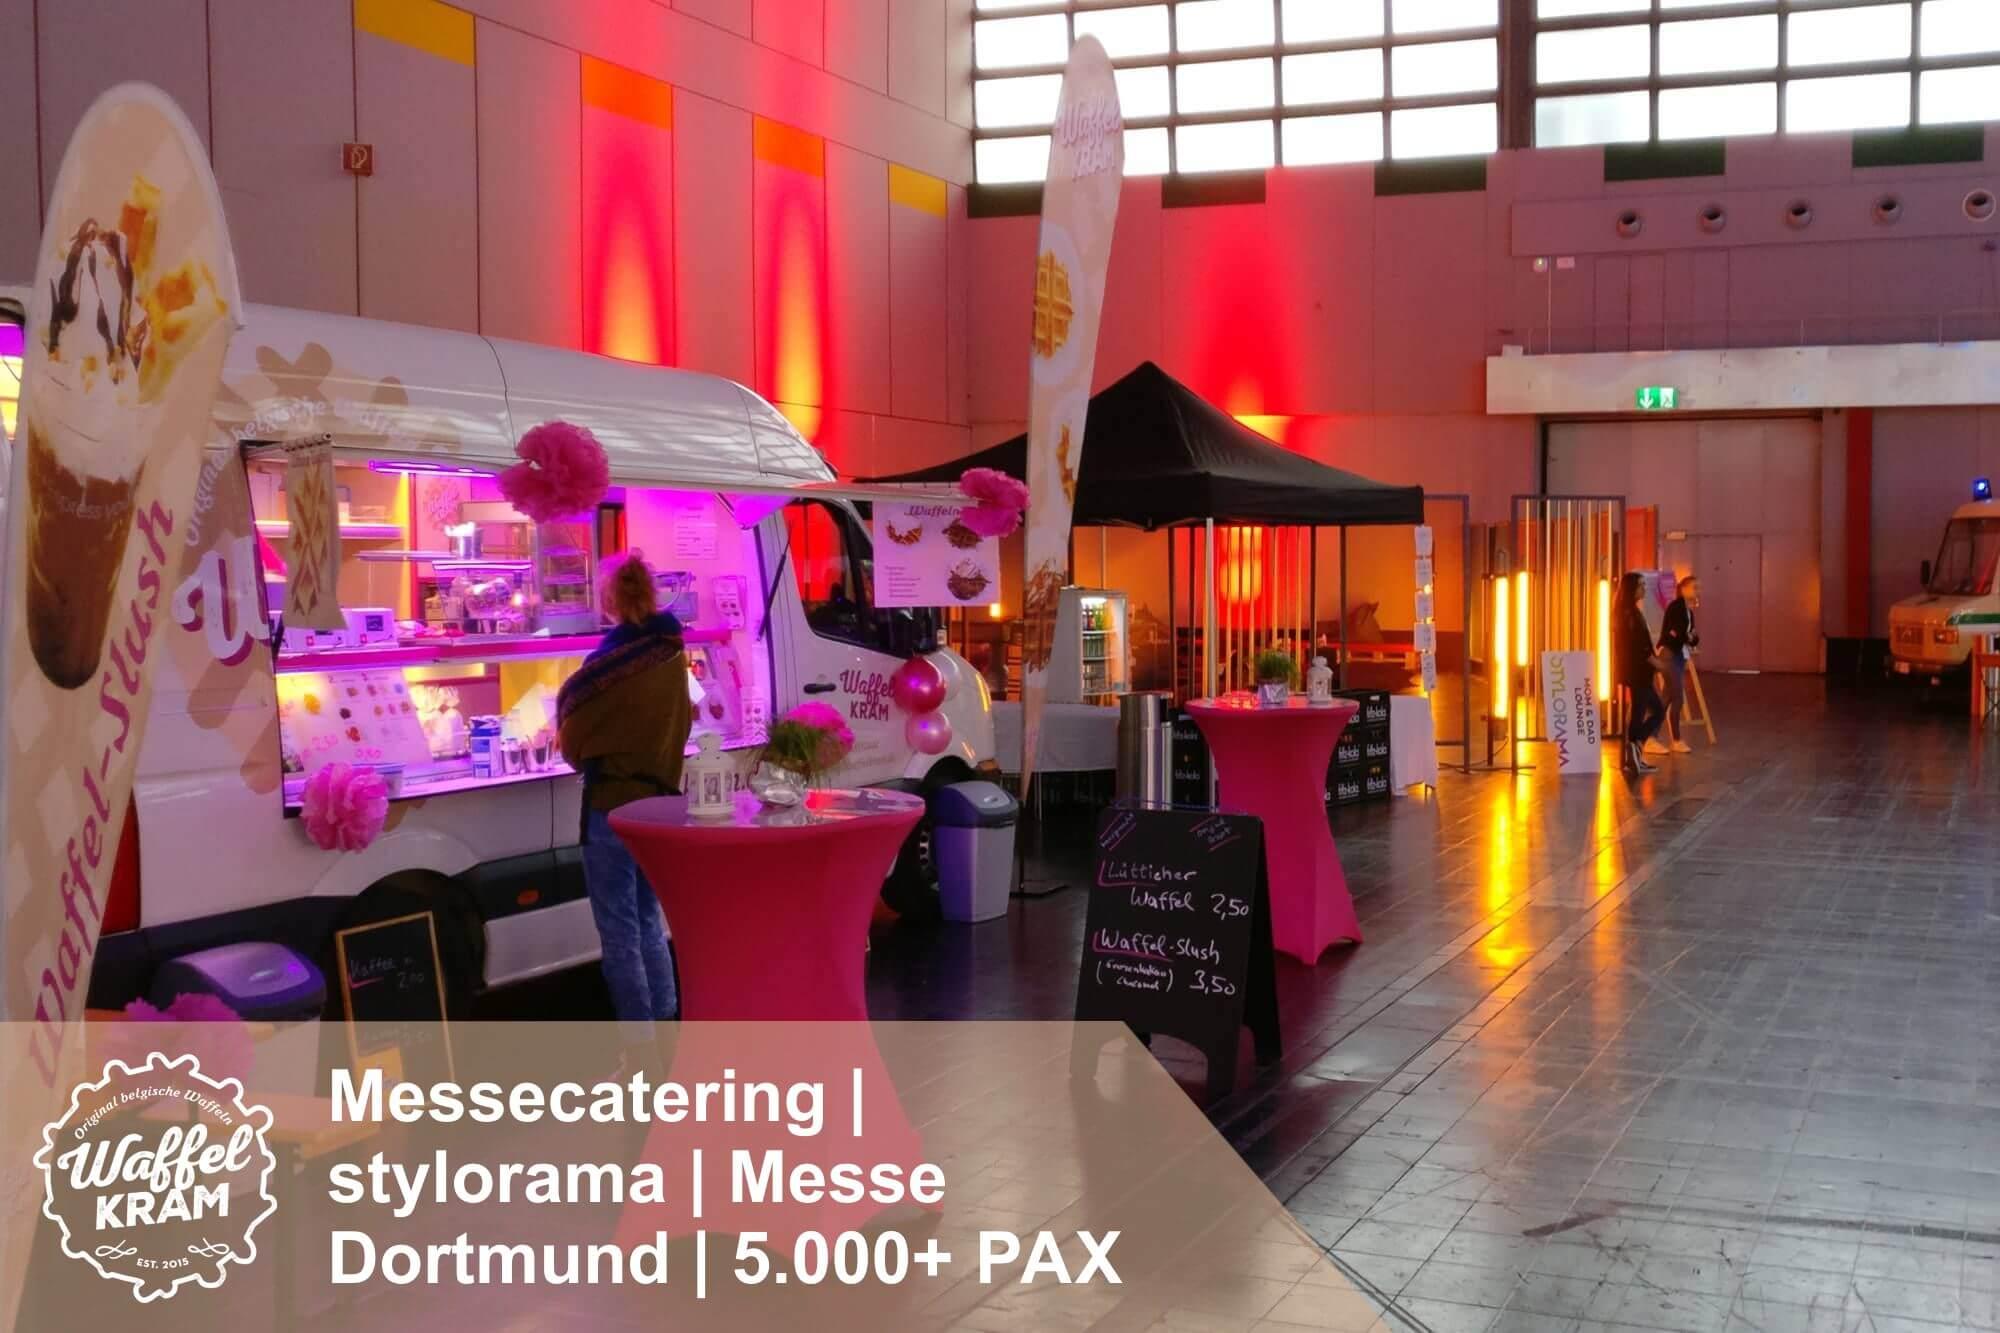 messecatering-indoor-stylorama-messe-dortmund-tx